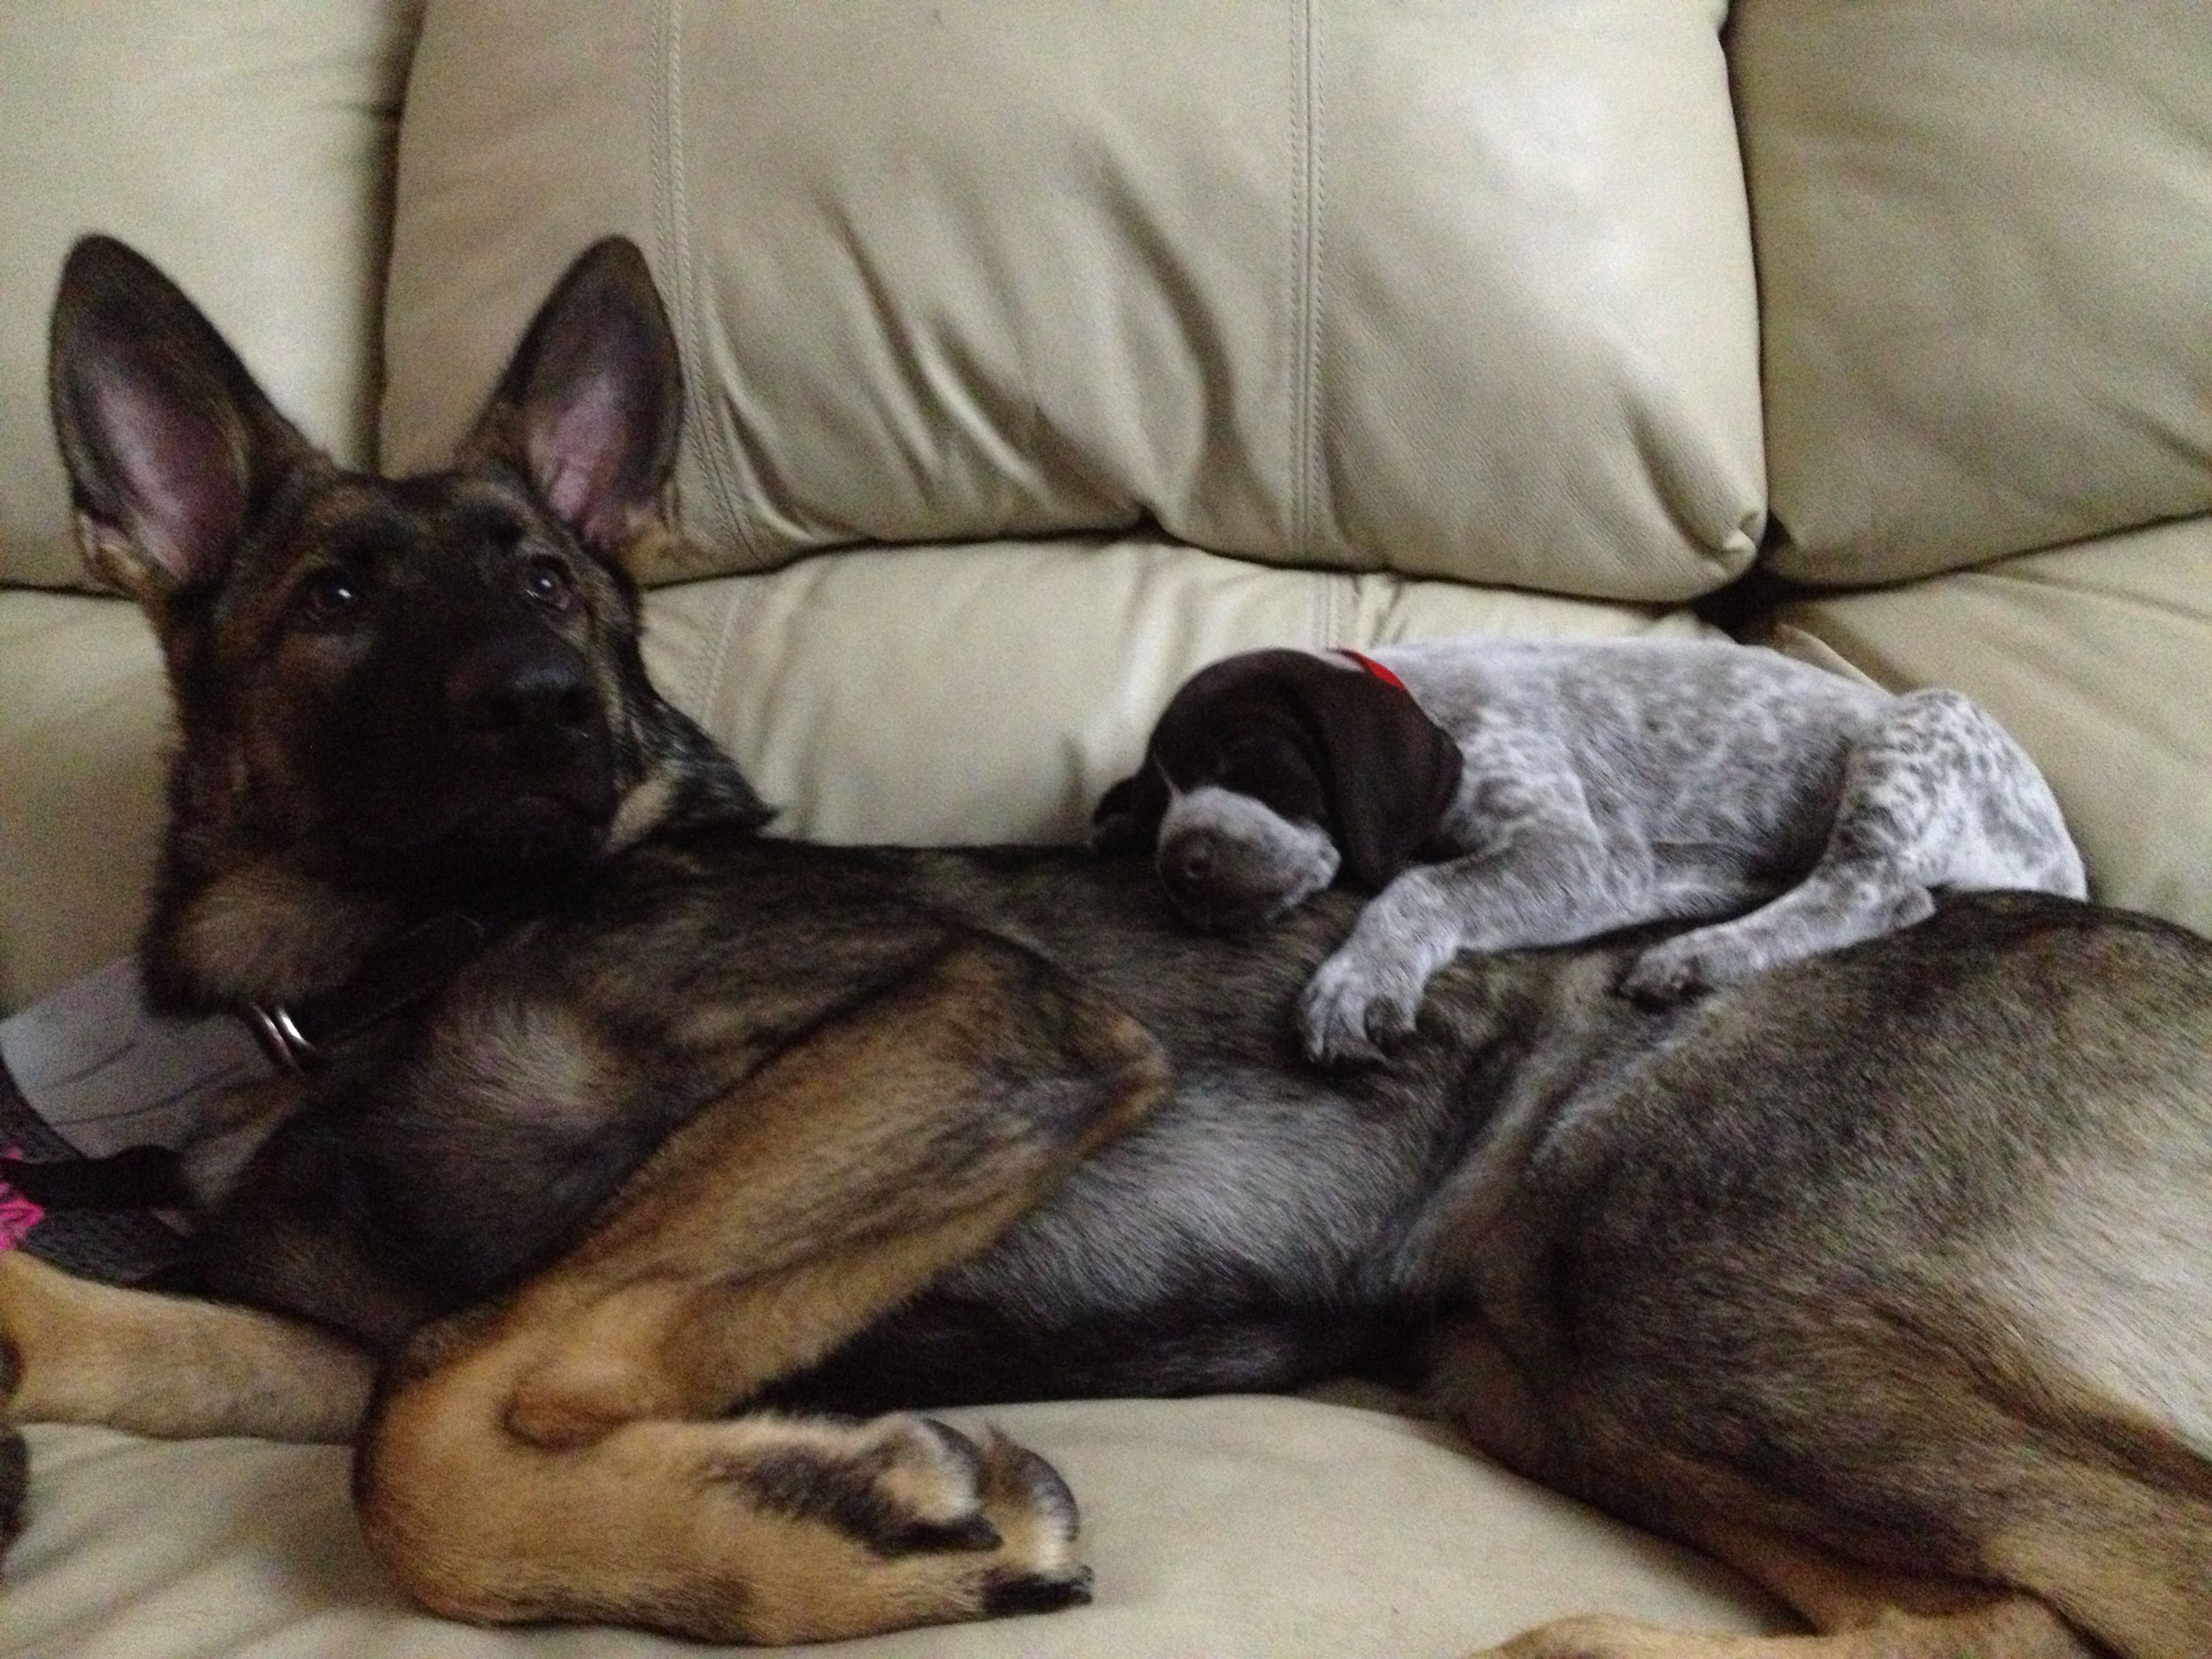 6 Months Old German Shepard And 8 Week Old Short Haired Pointer Gsp German Shorthair Animal Lover Pets